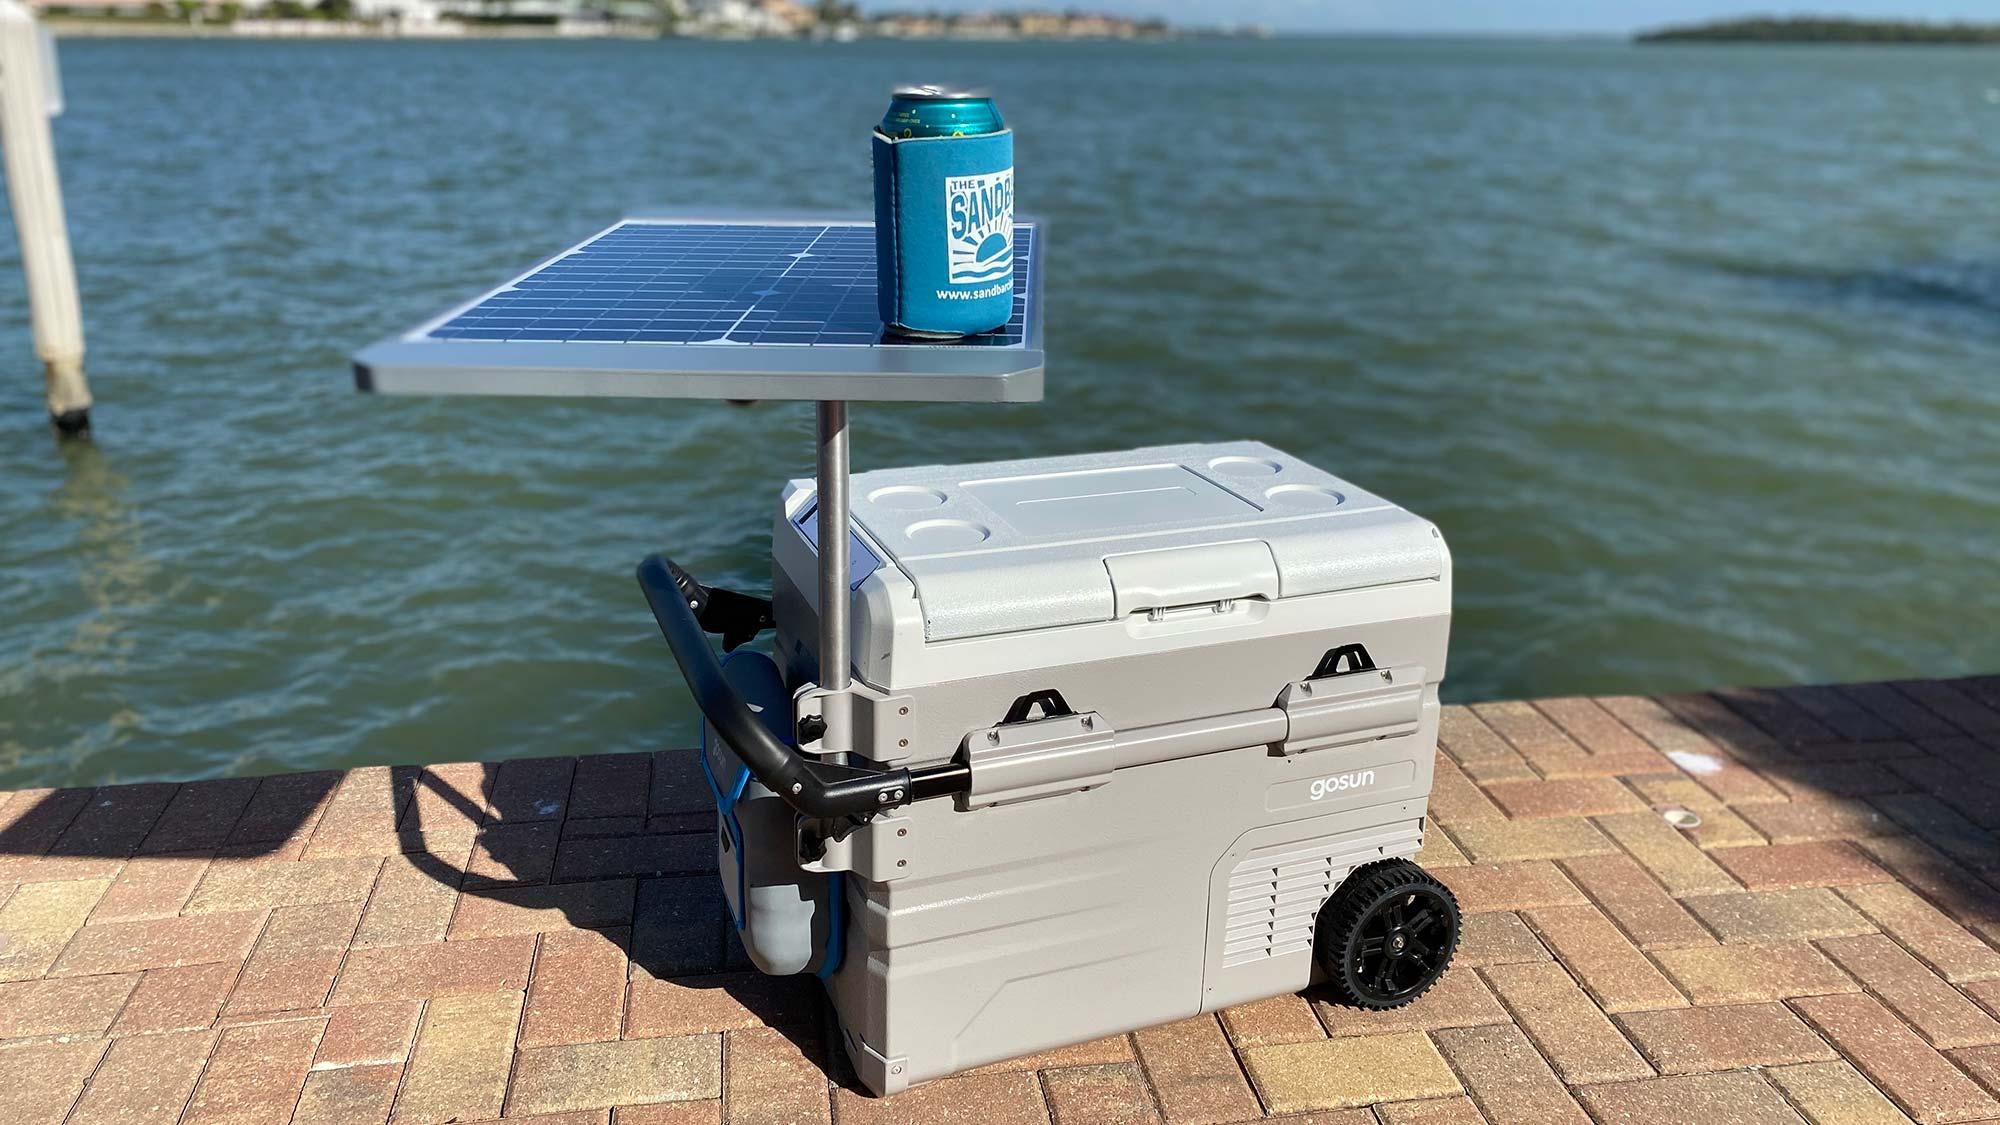 GoSun Chillest Electric Cooler Indiegogo